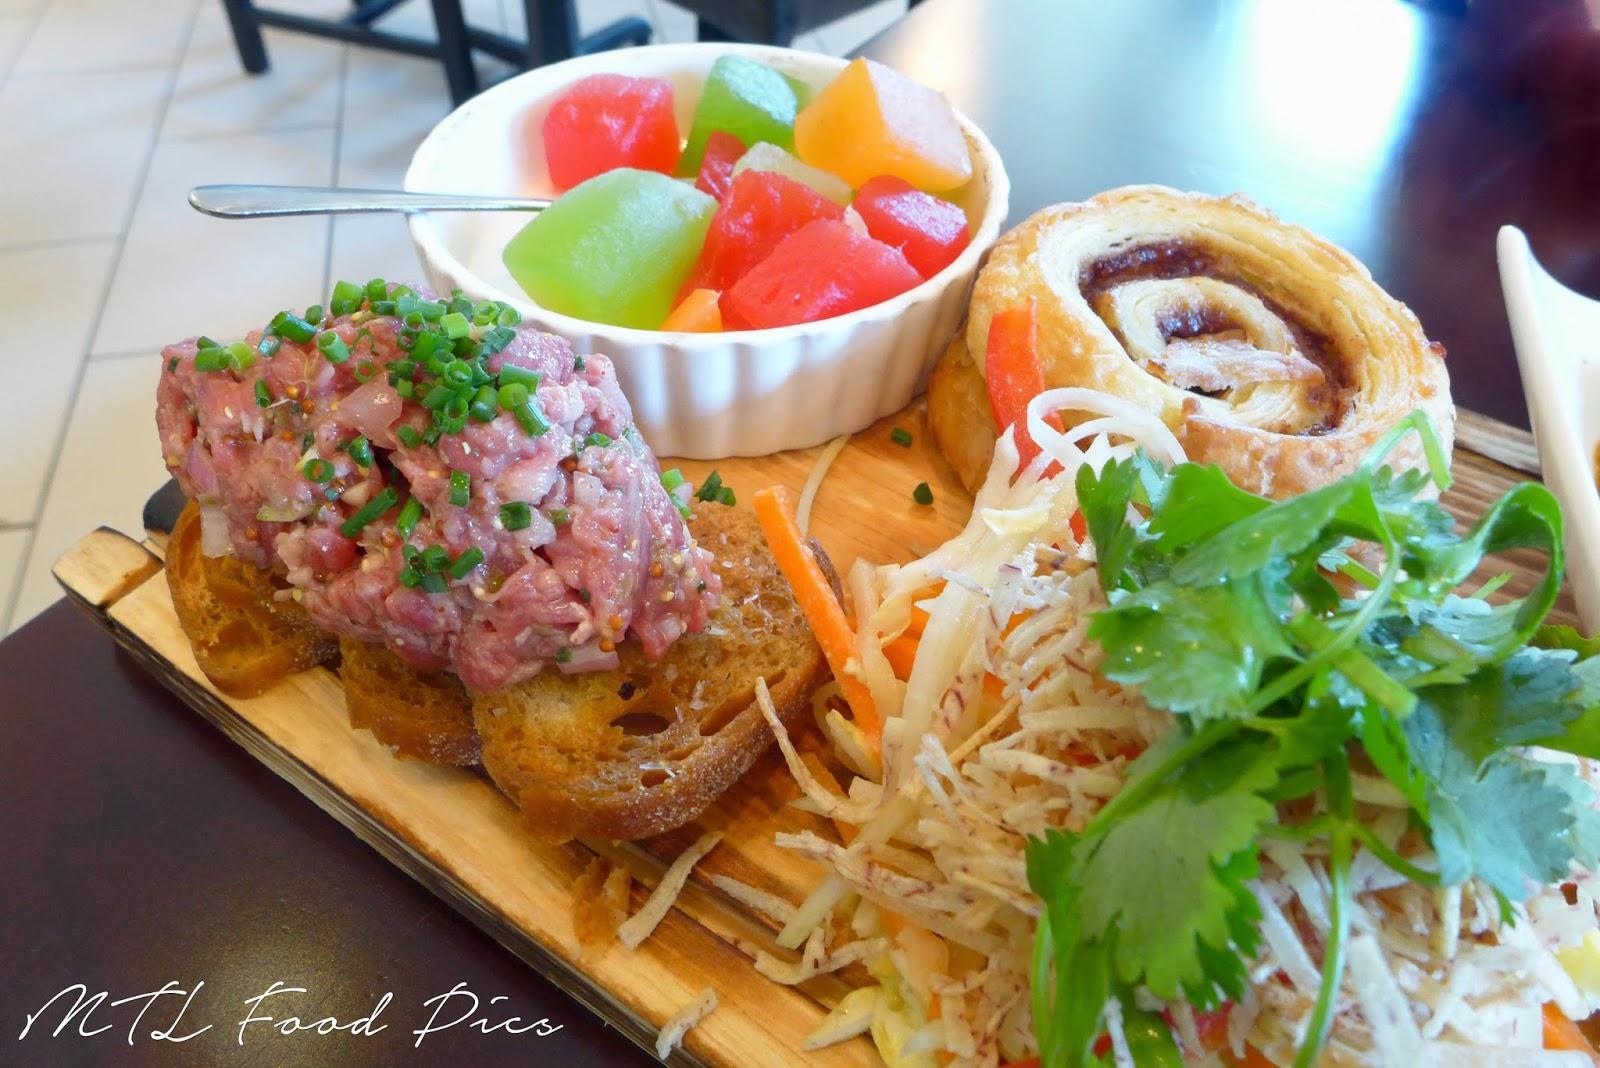 NEXT restaurant - steak tartare, papaya salad, melons, croissants Ottawa